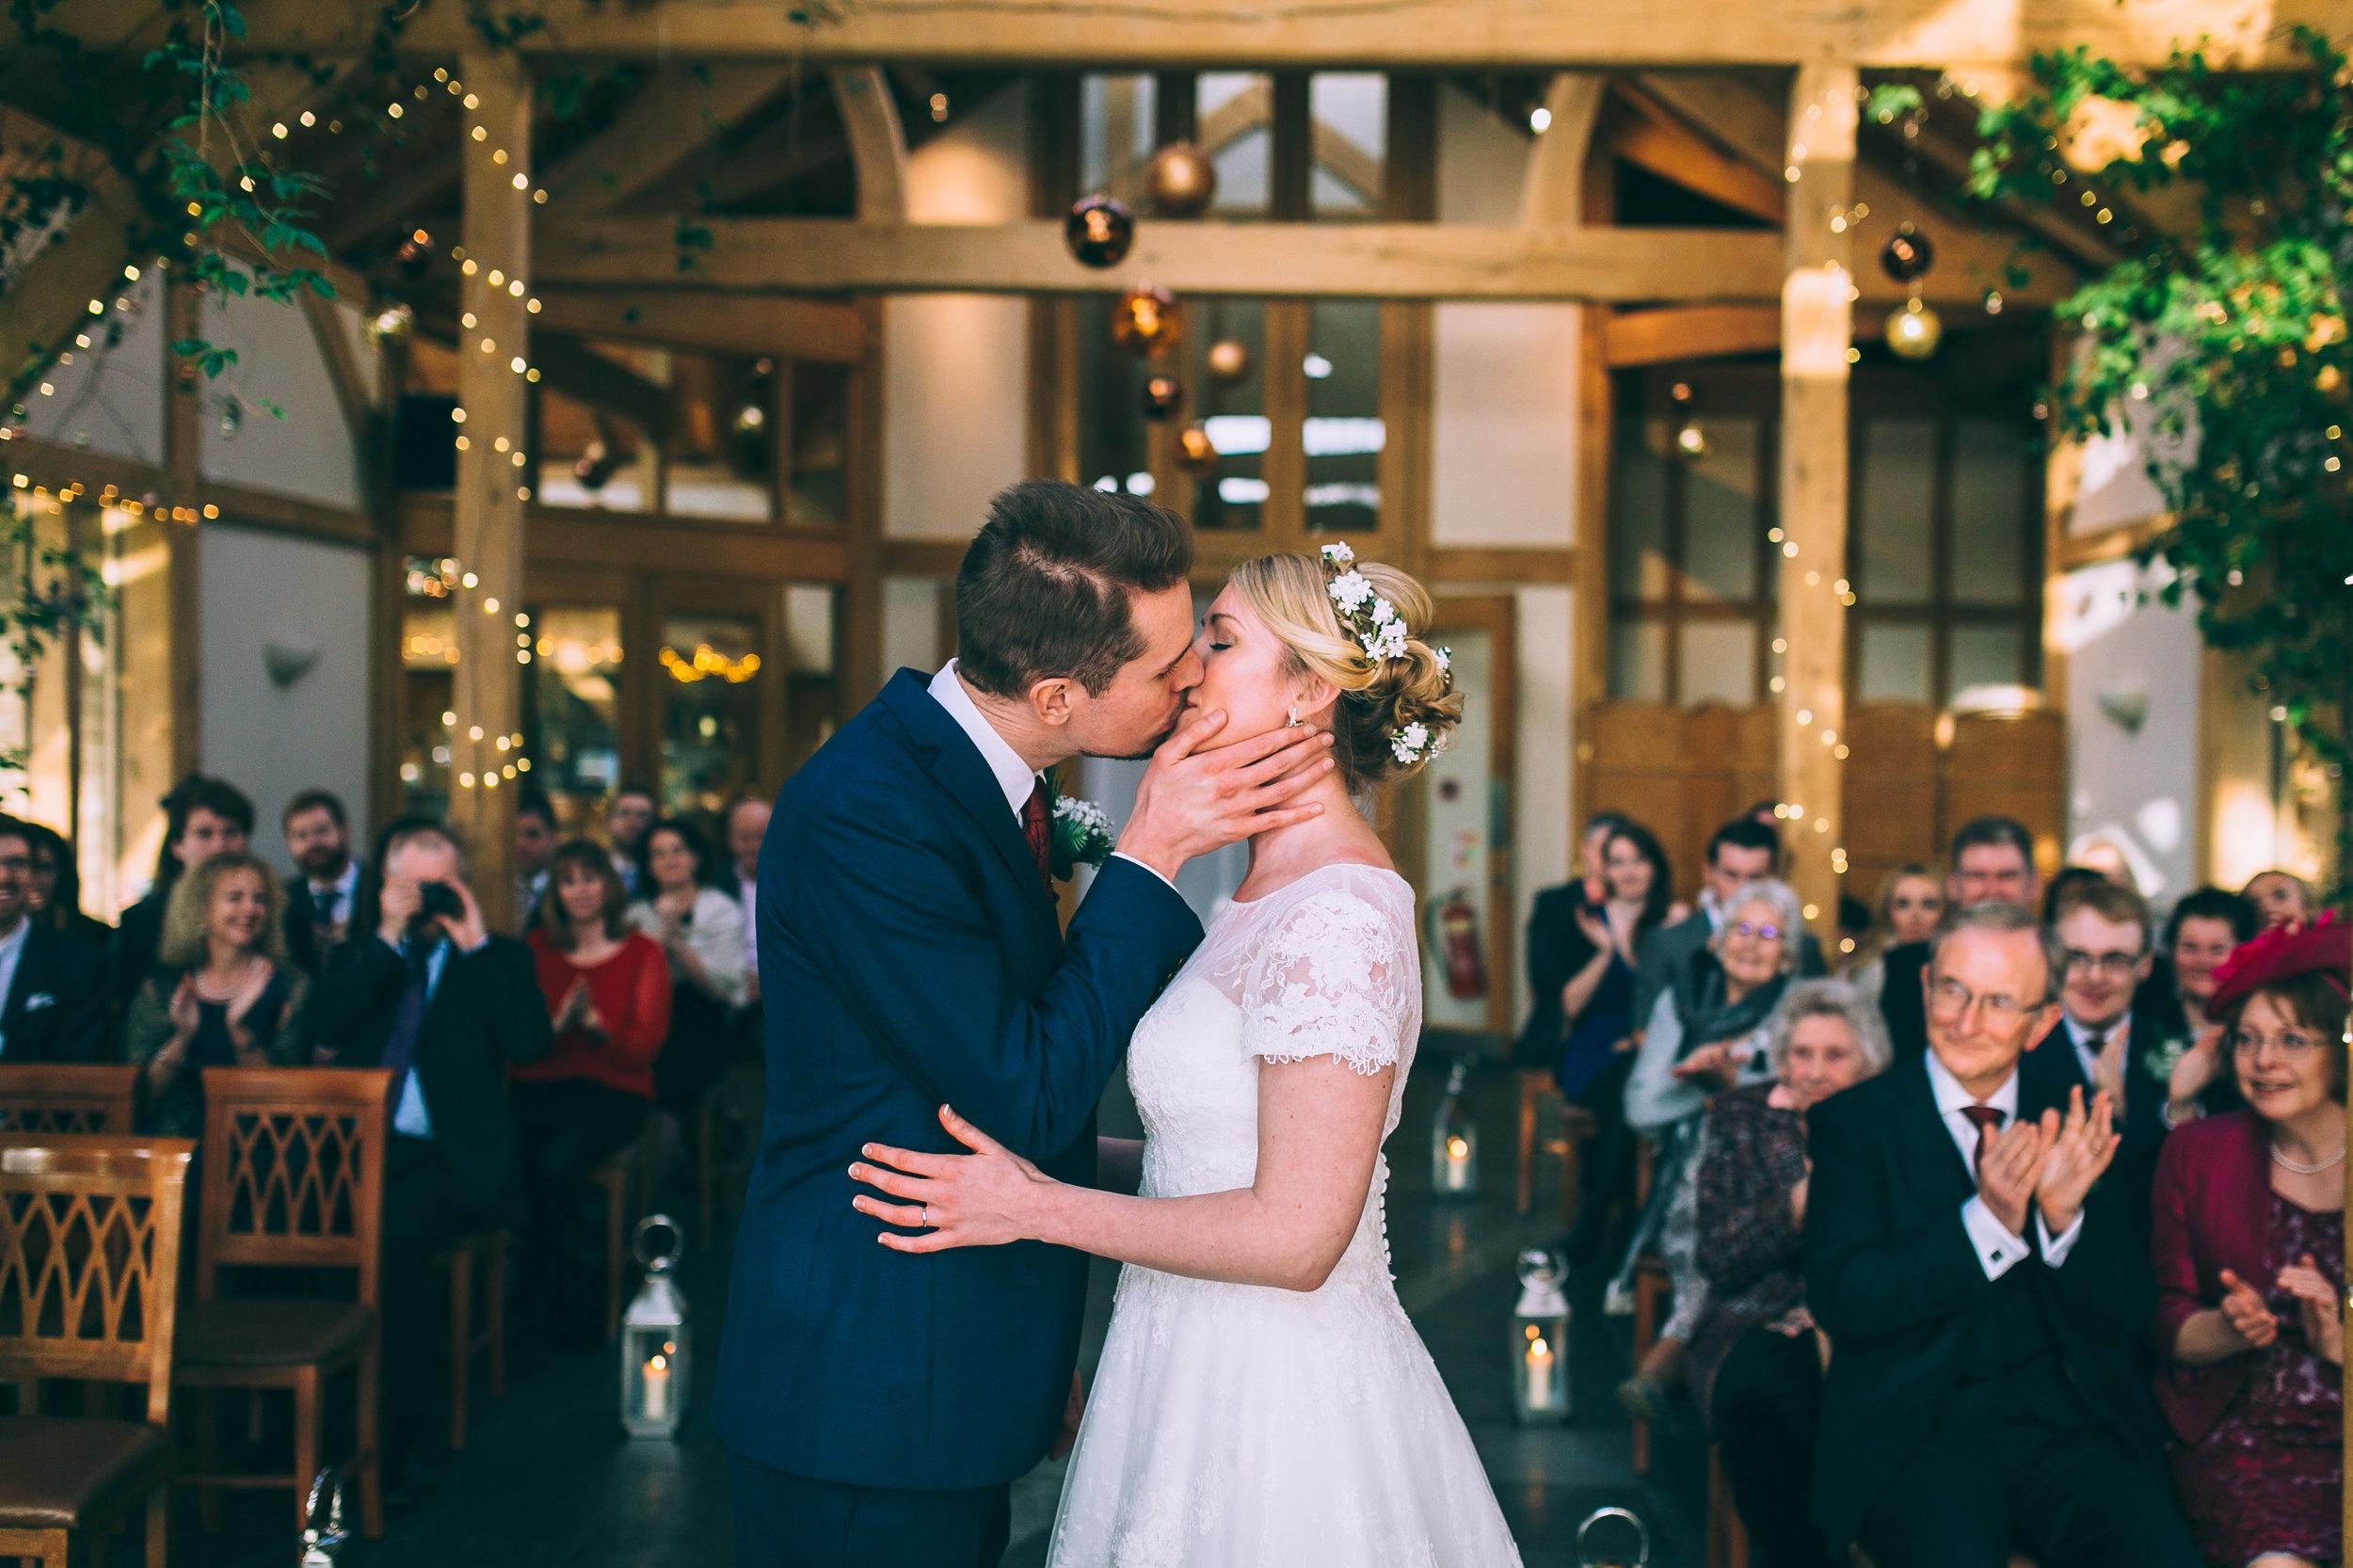 Clare&Iain-Wedding-at-The-Oak-Tree-Over-tom-biddle-photographer-tb195.jpg